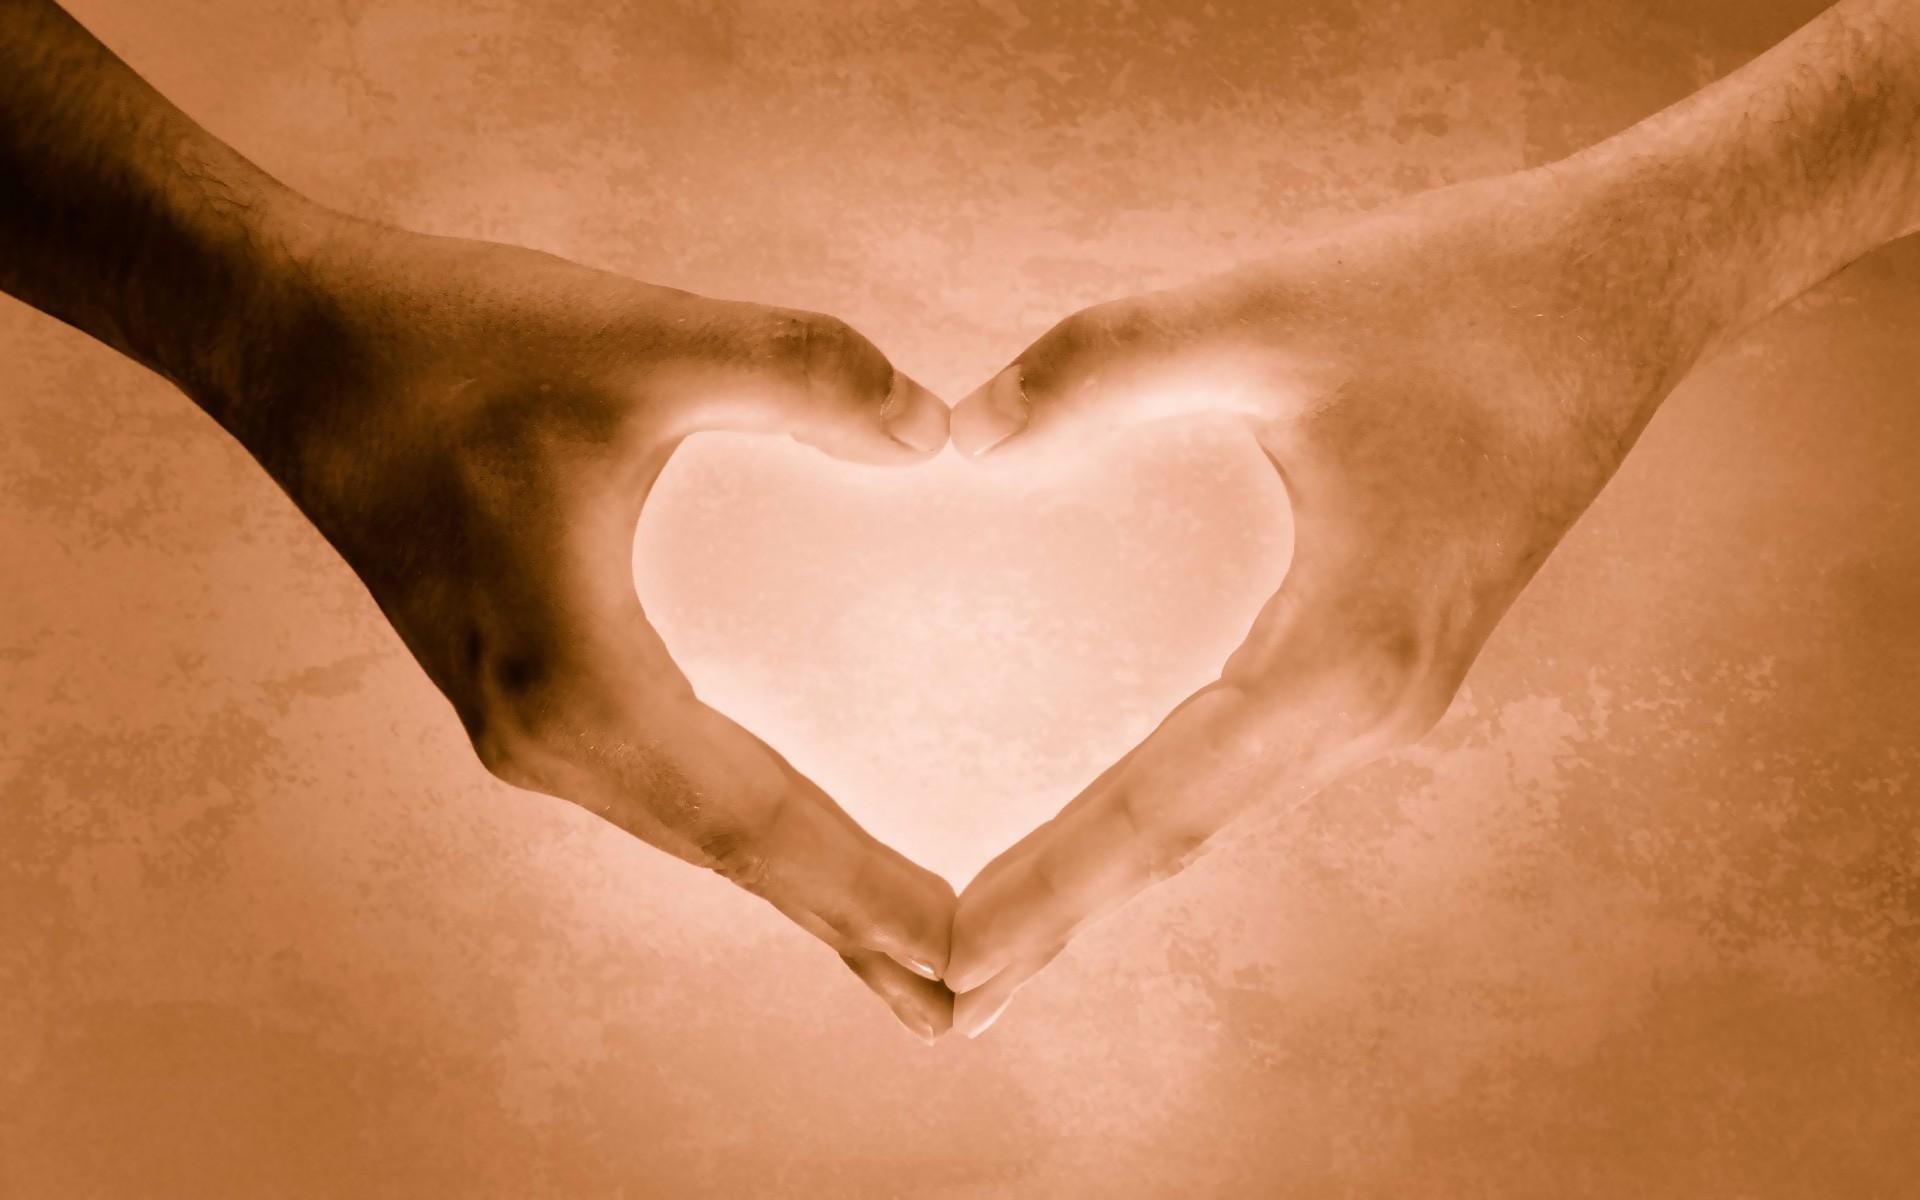 heart_hand_love_hd.jpg